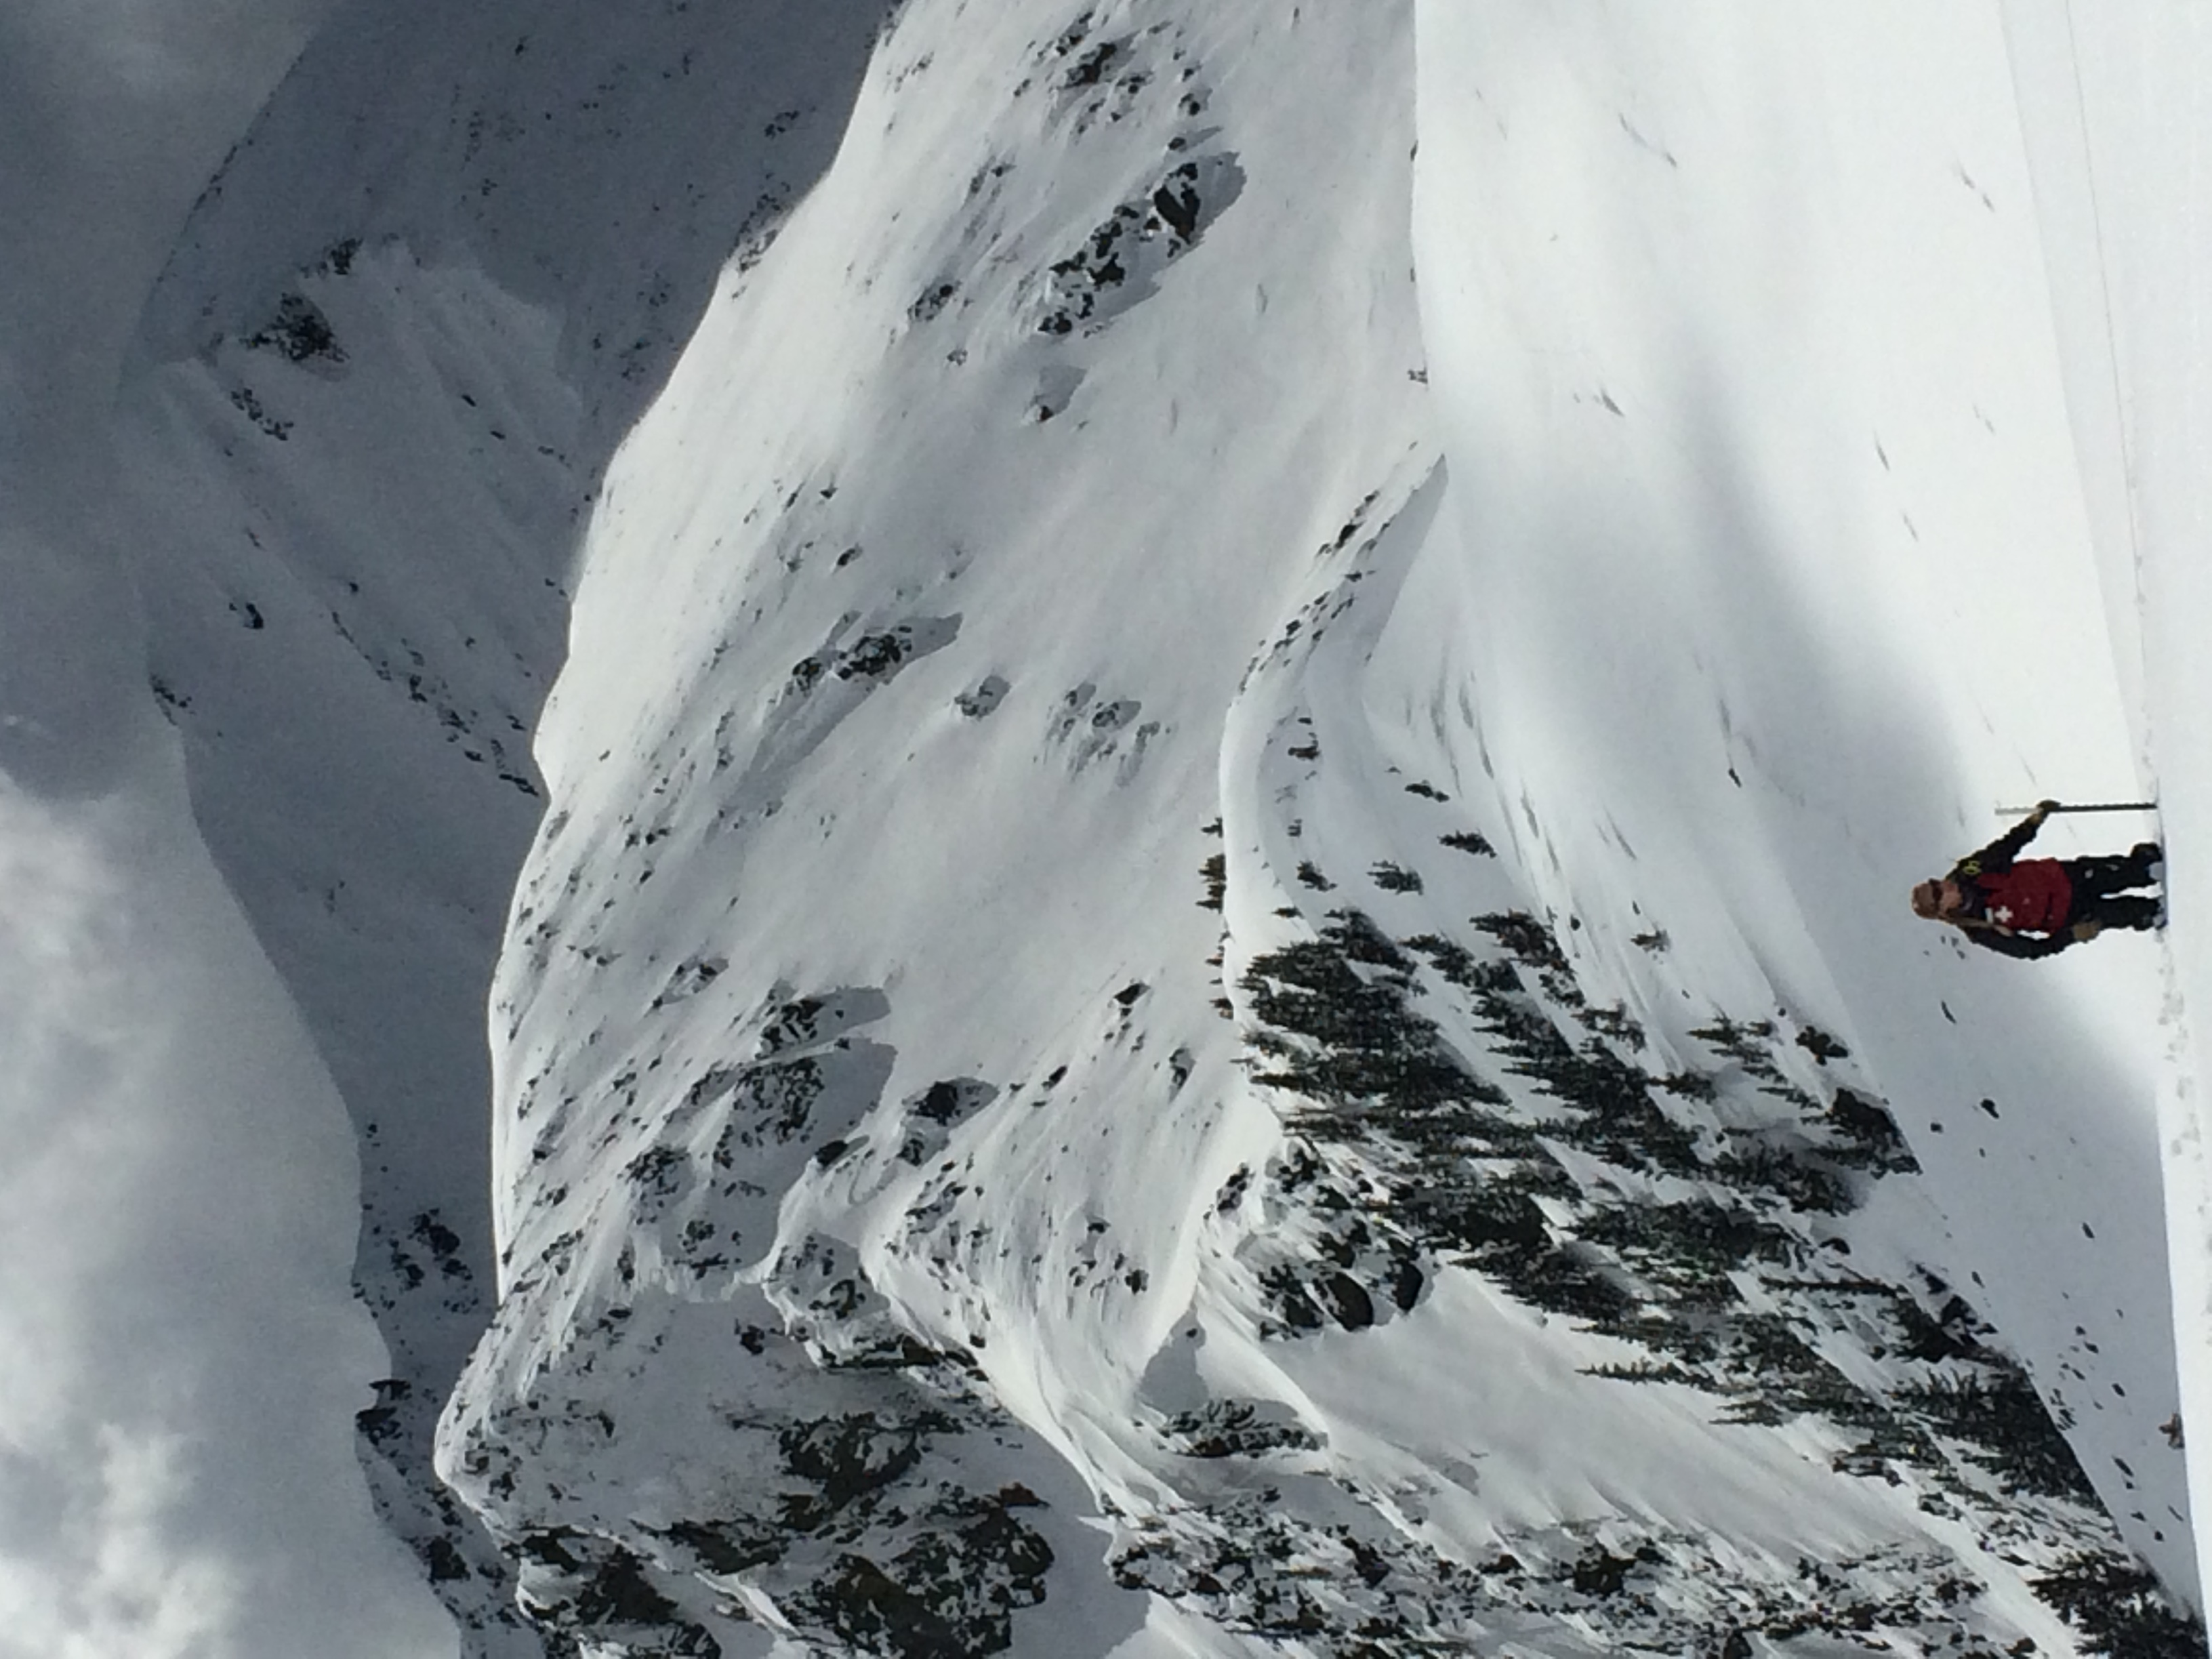 Kachina Peak 2015 Photo by Brett Hills